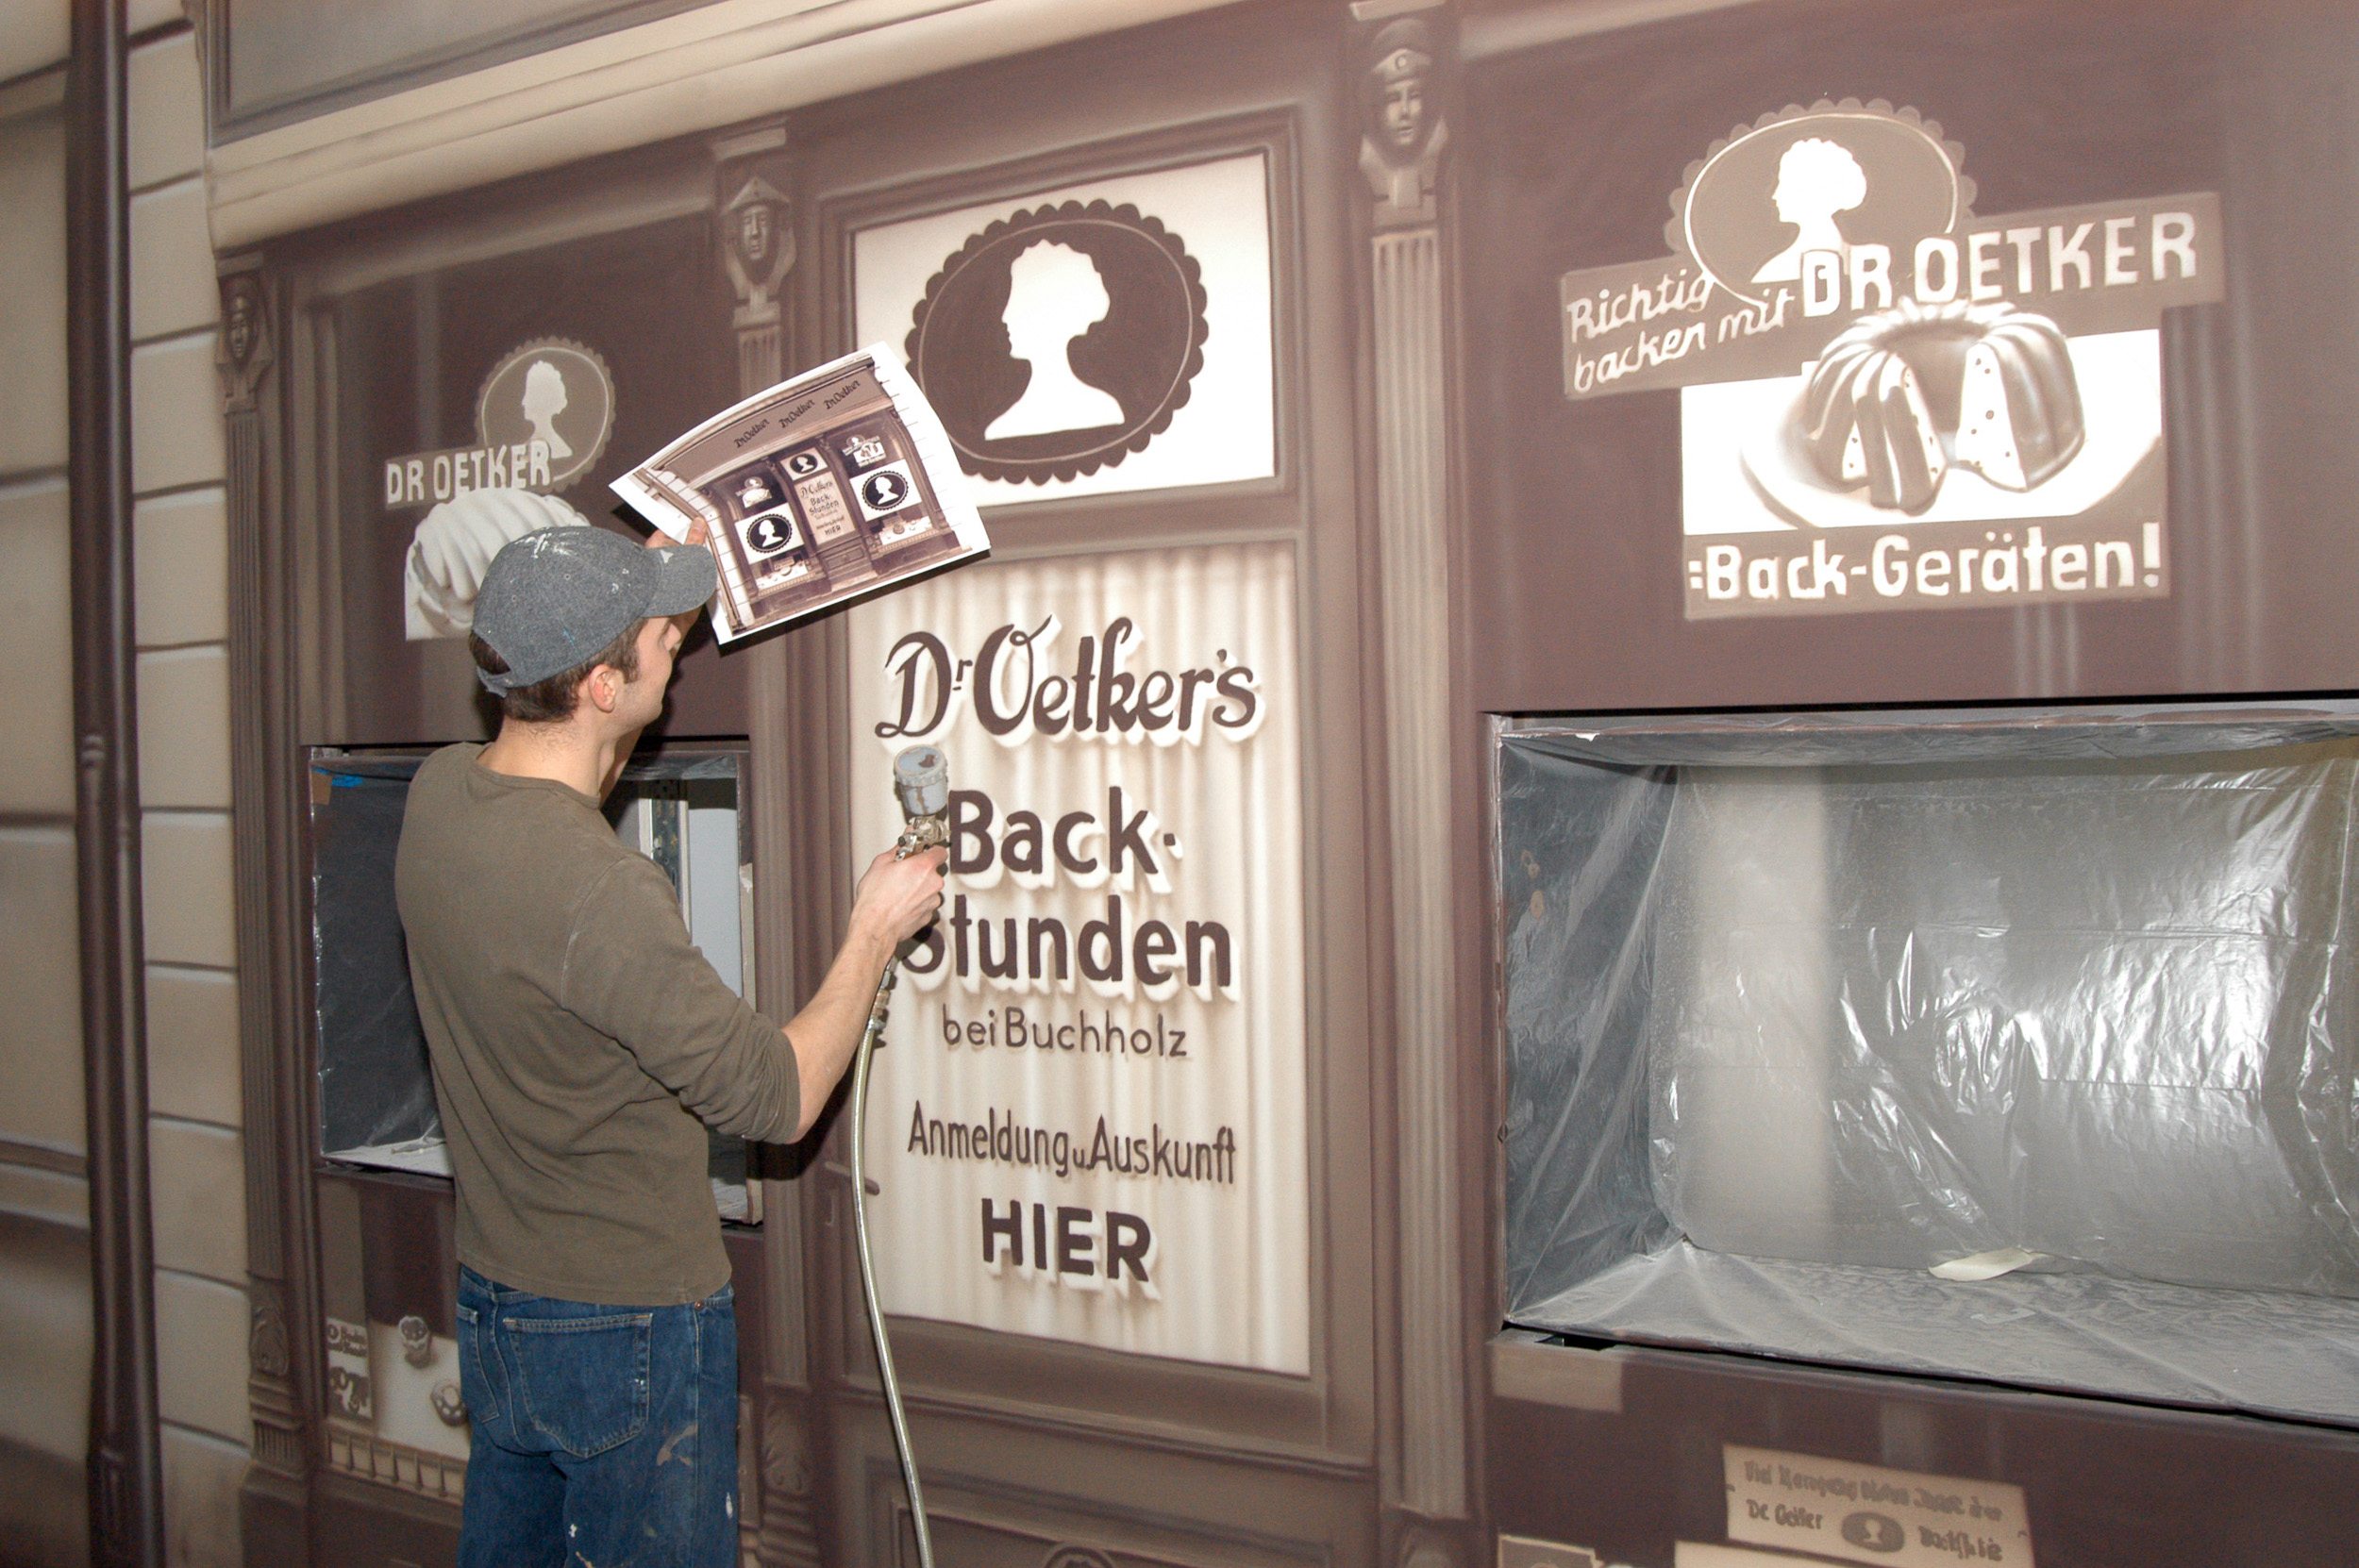 Fassadengestaltung-kein-graffiti-airbrush-dr-oetker-museum.jpg